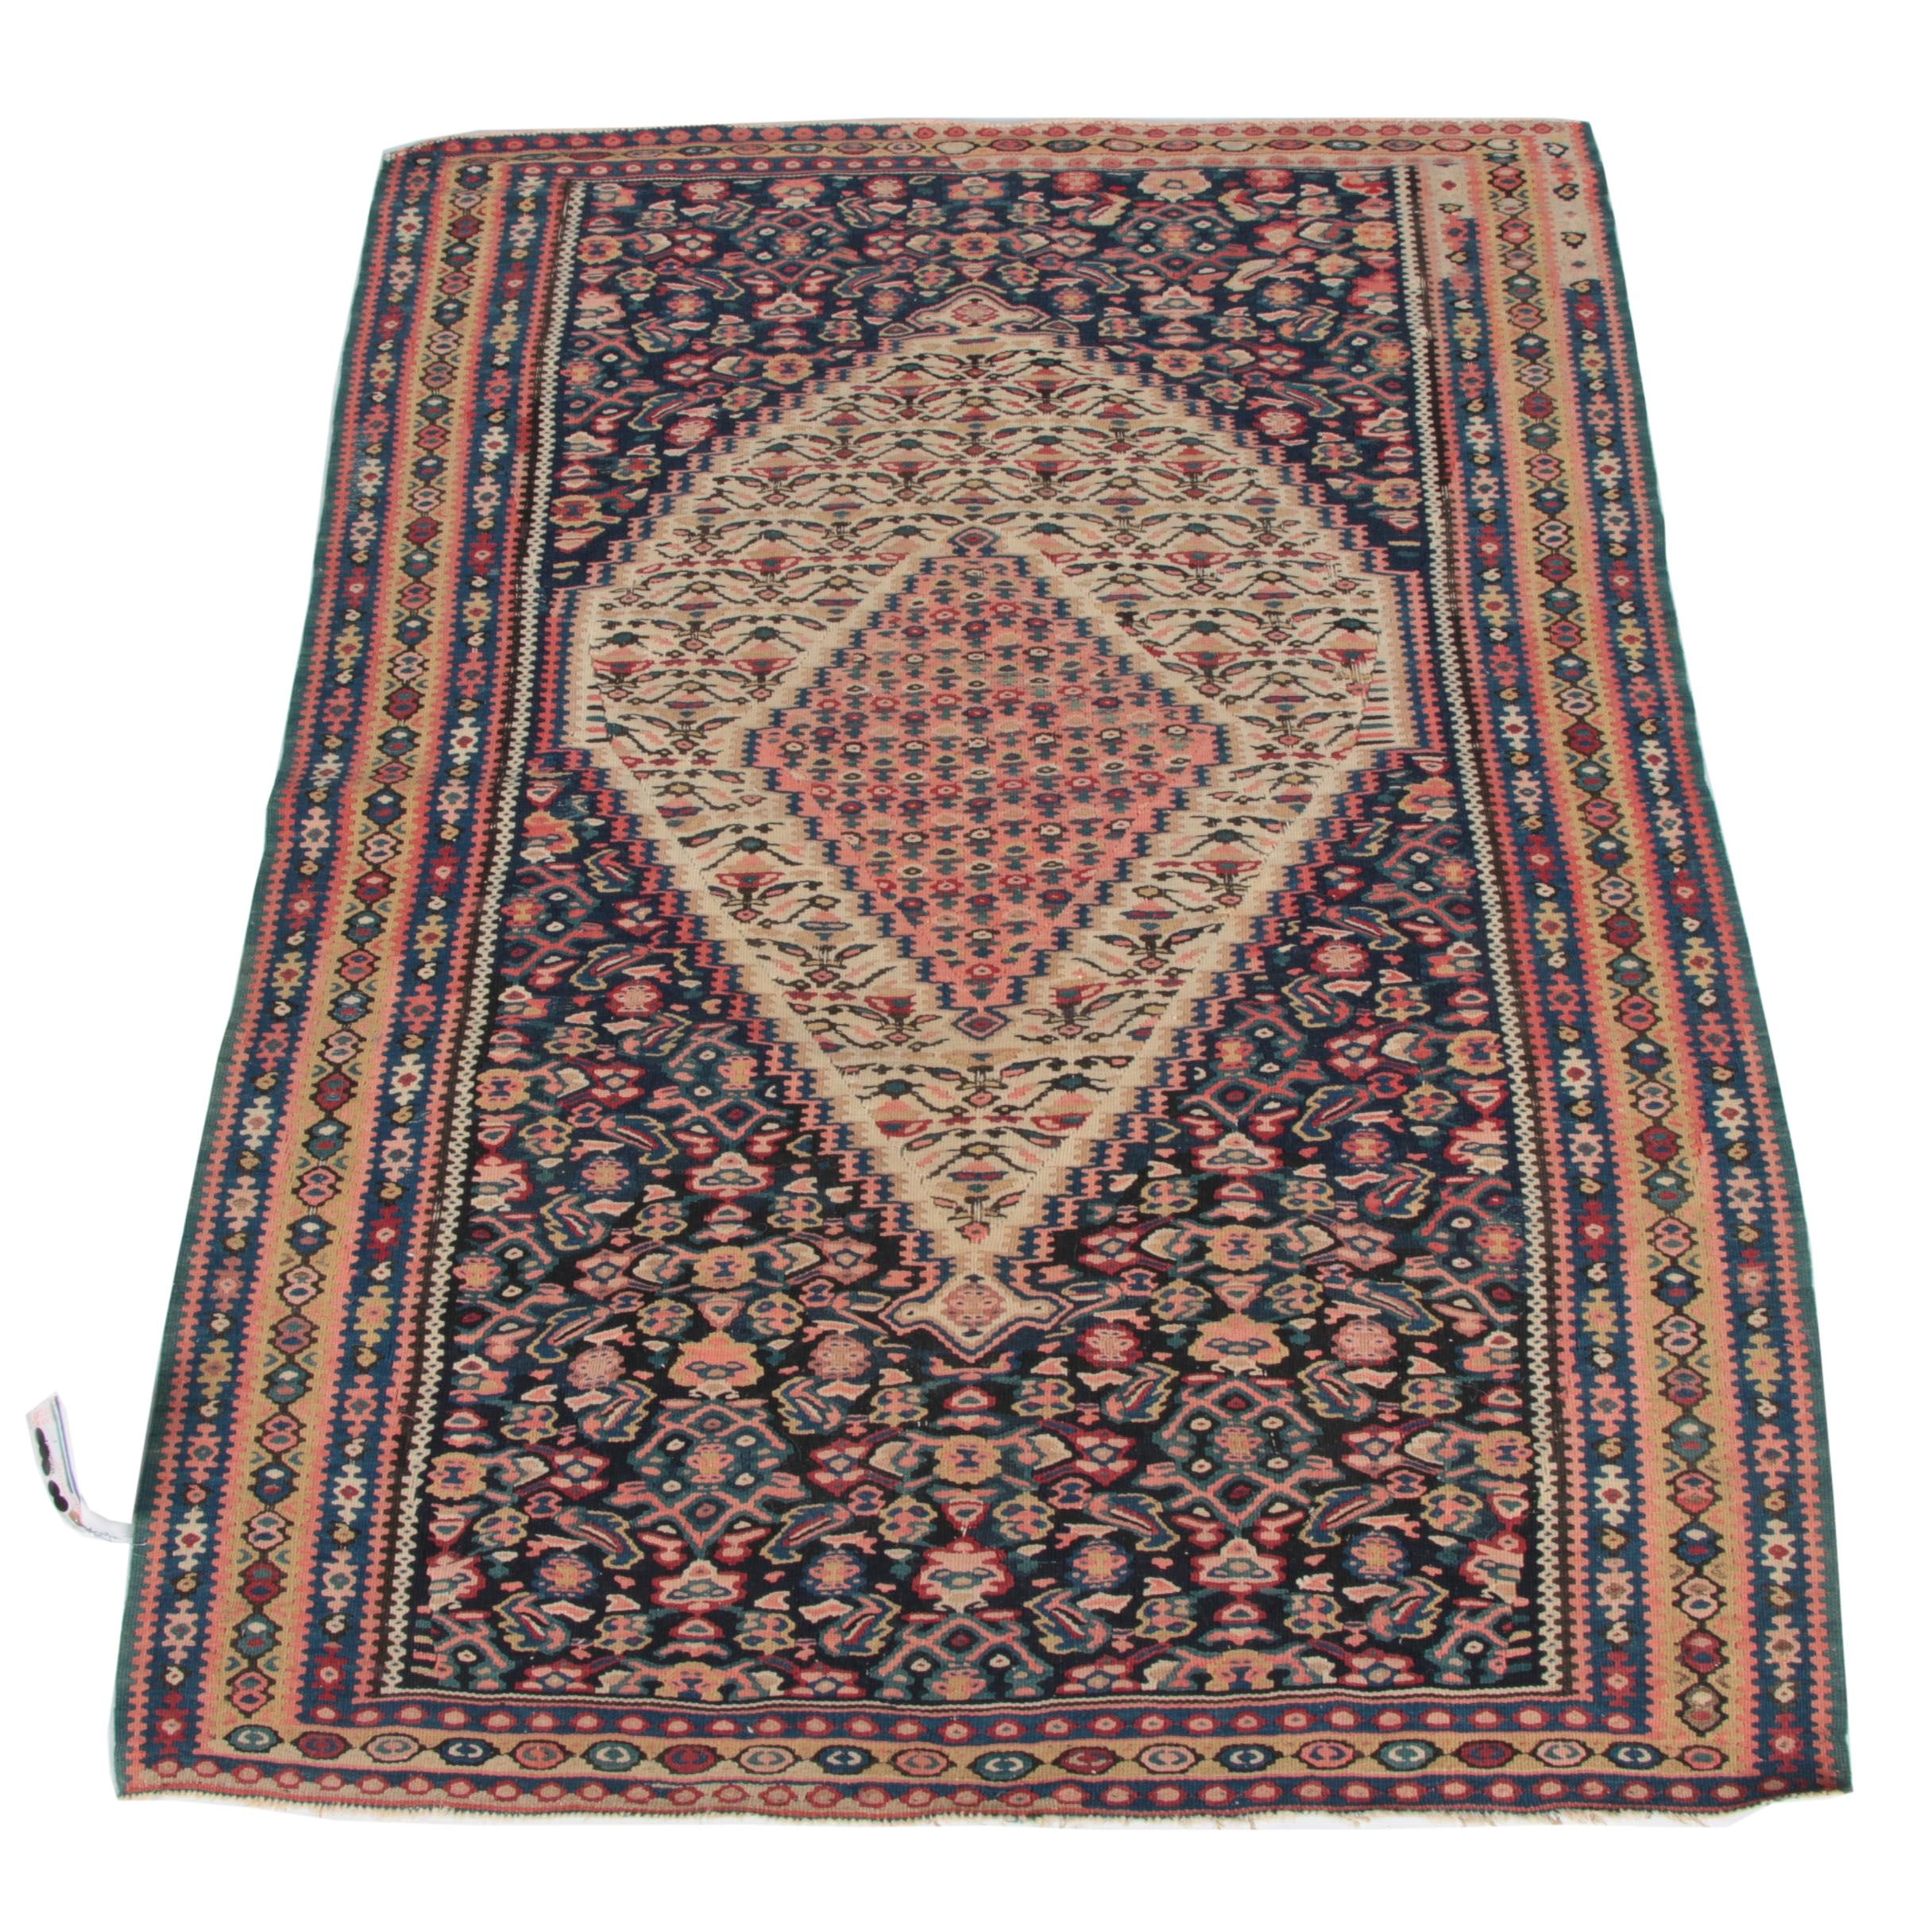 Handwoven Senneh Wool Kilim Accent Rug